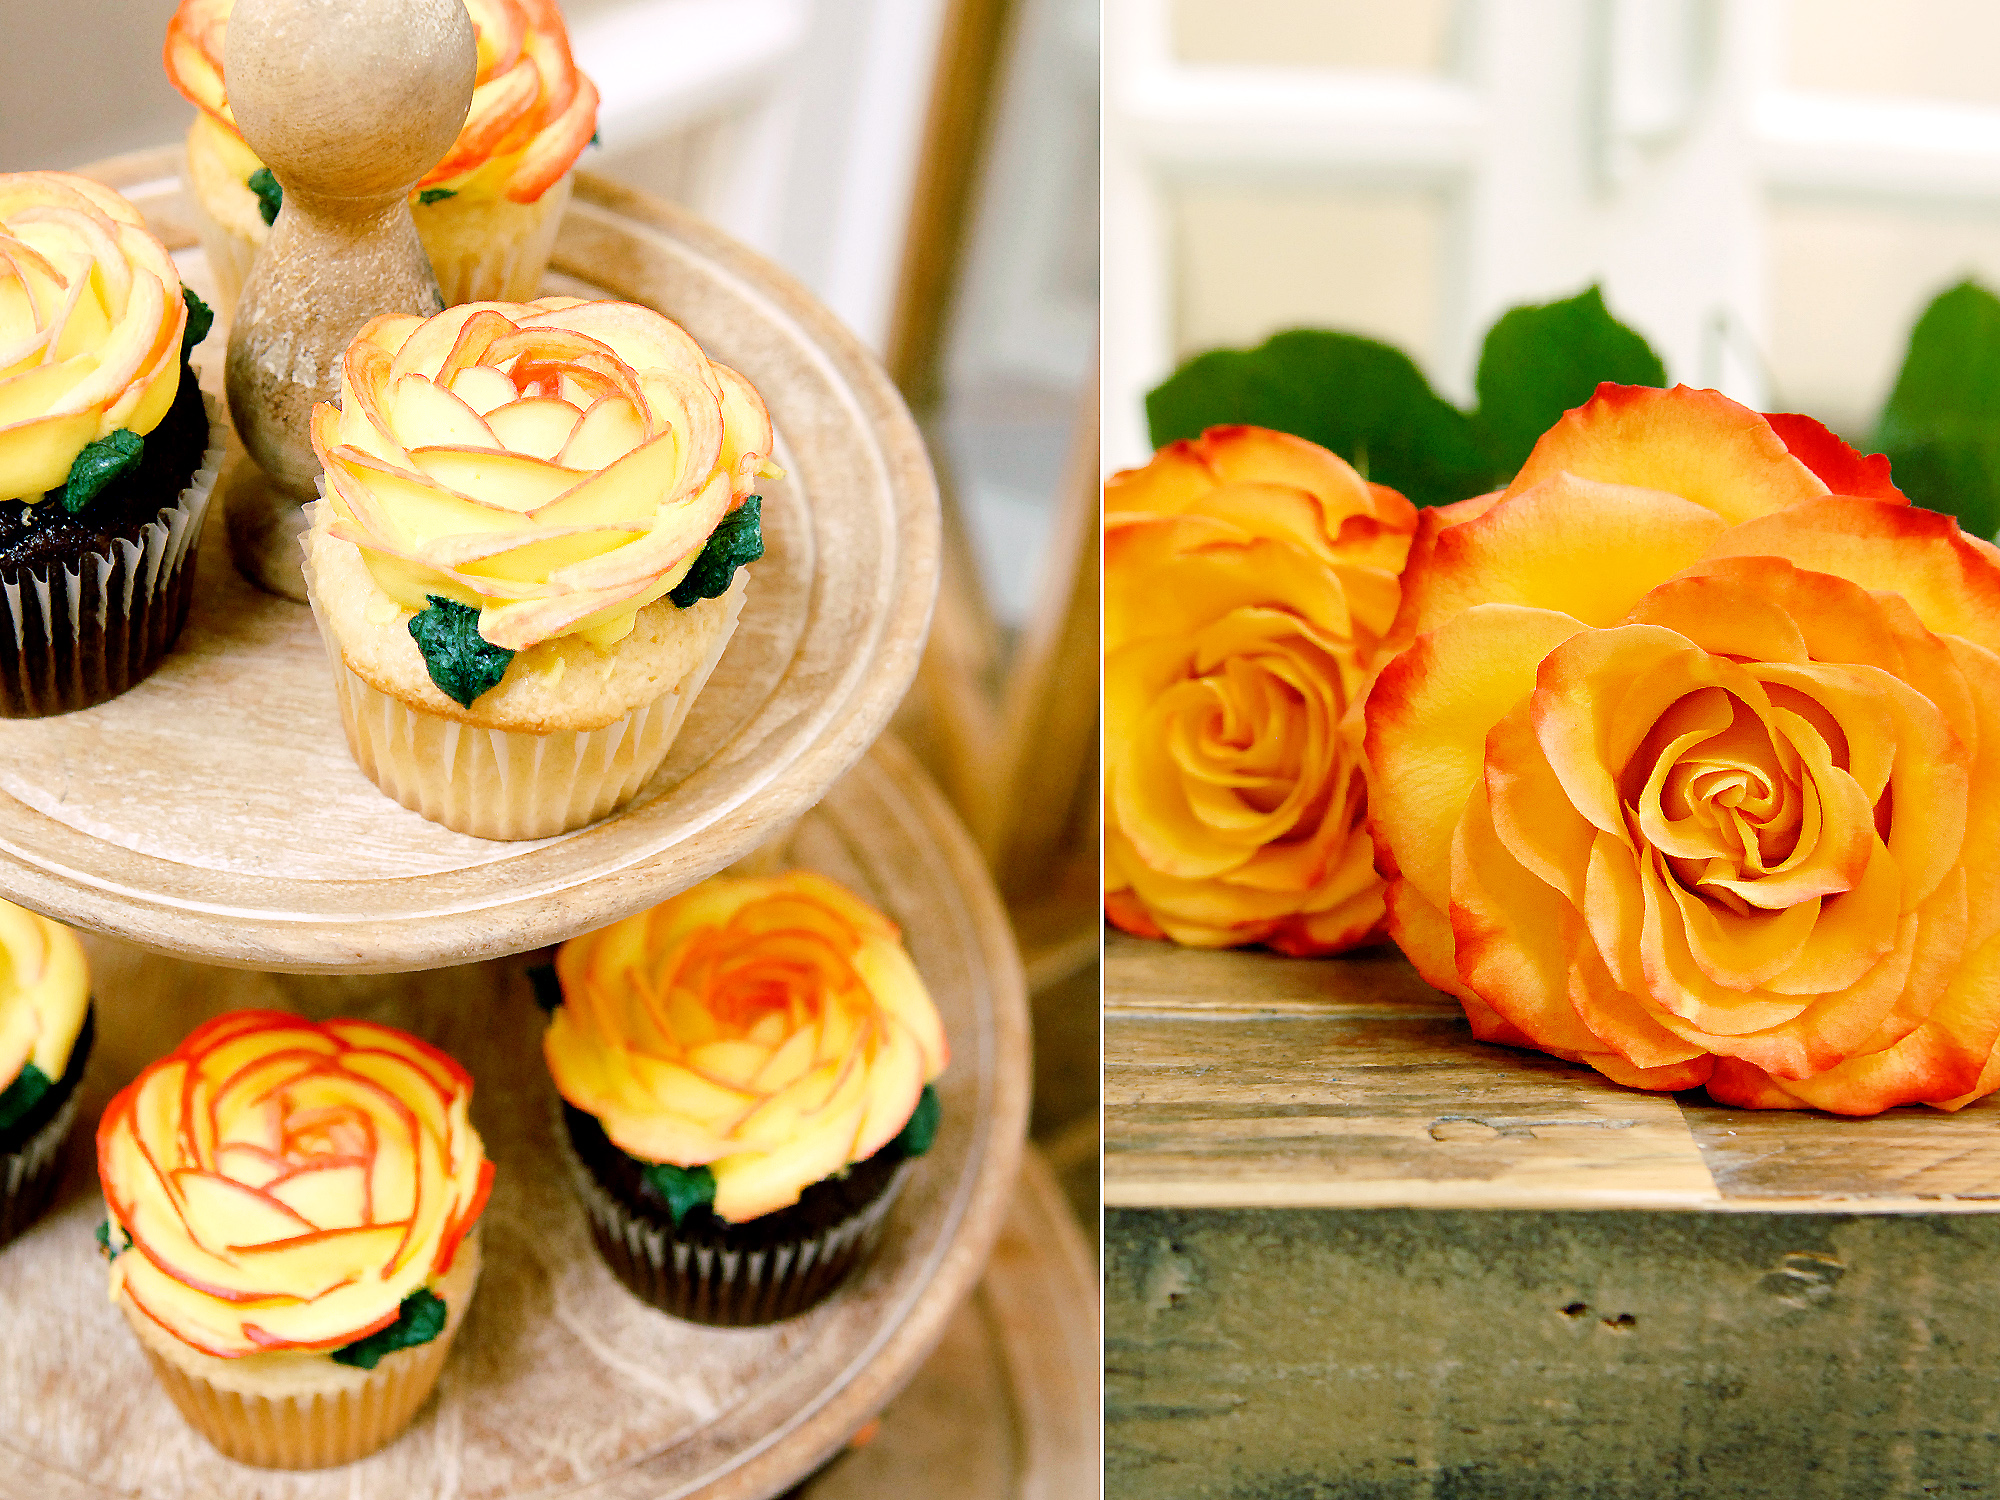 Custom_decorated_cupcakes_014.jpg